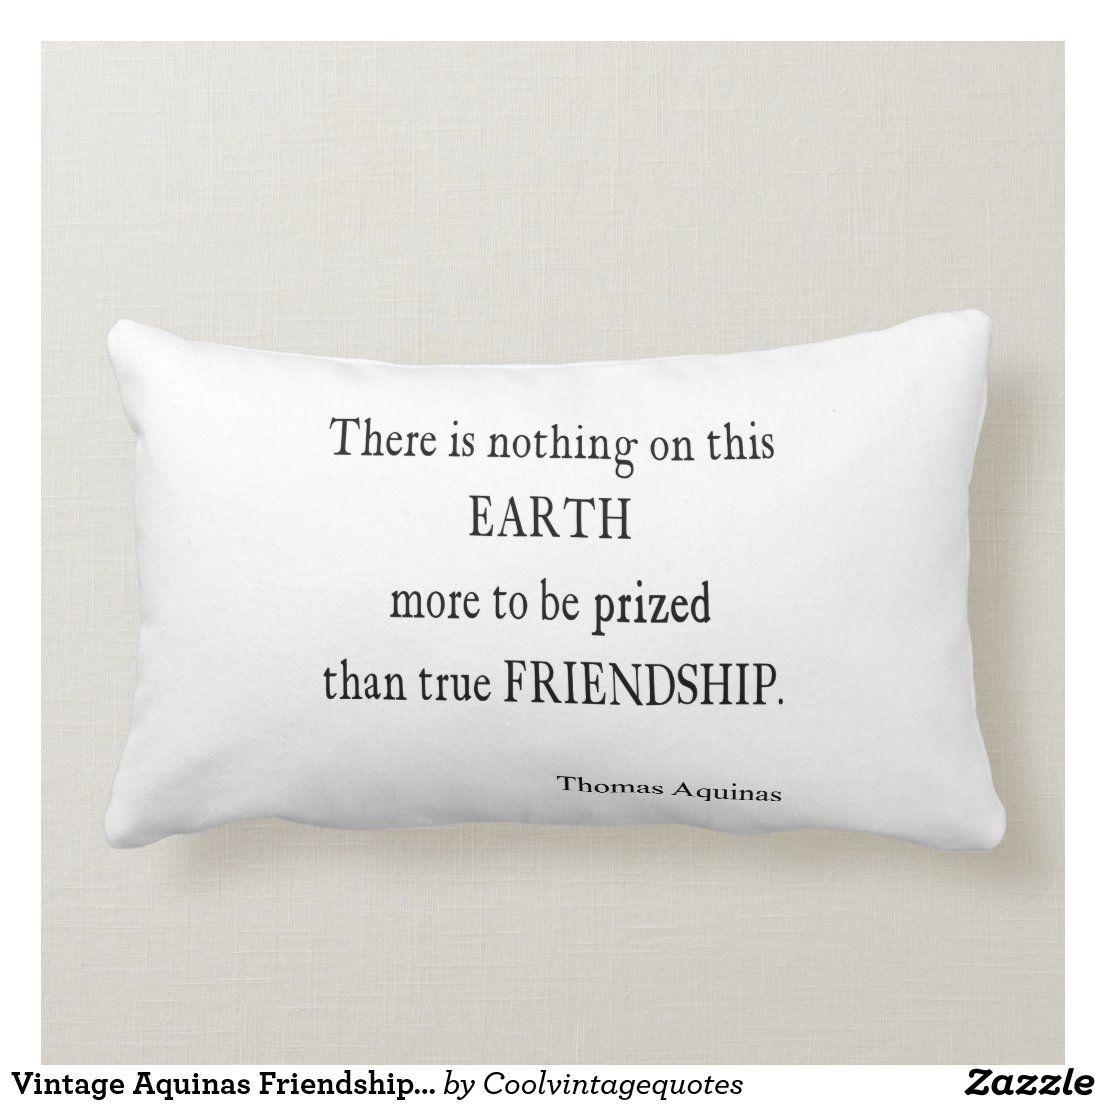 Vintage Aquinas Friendship Inspirational Quote Lumbar Pillow